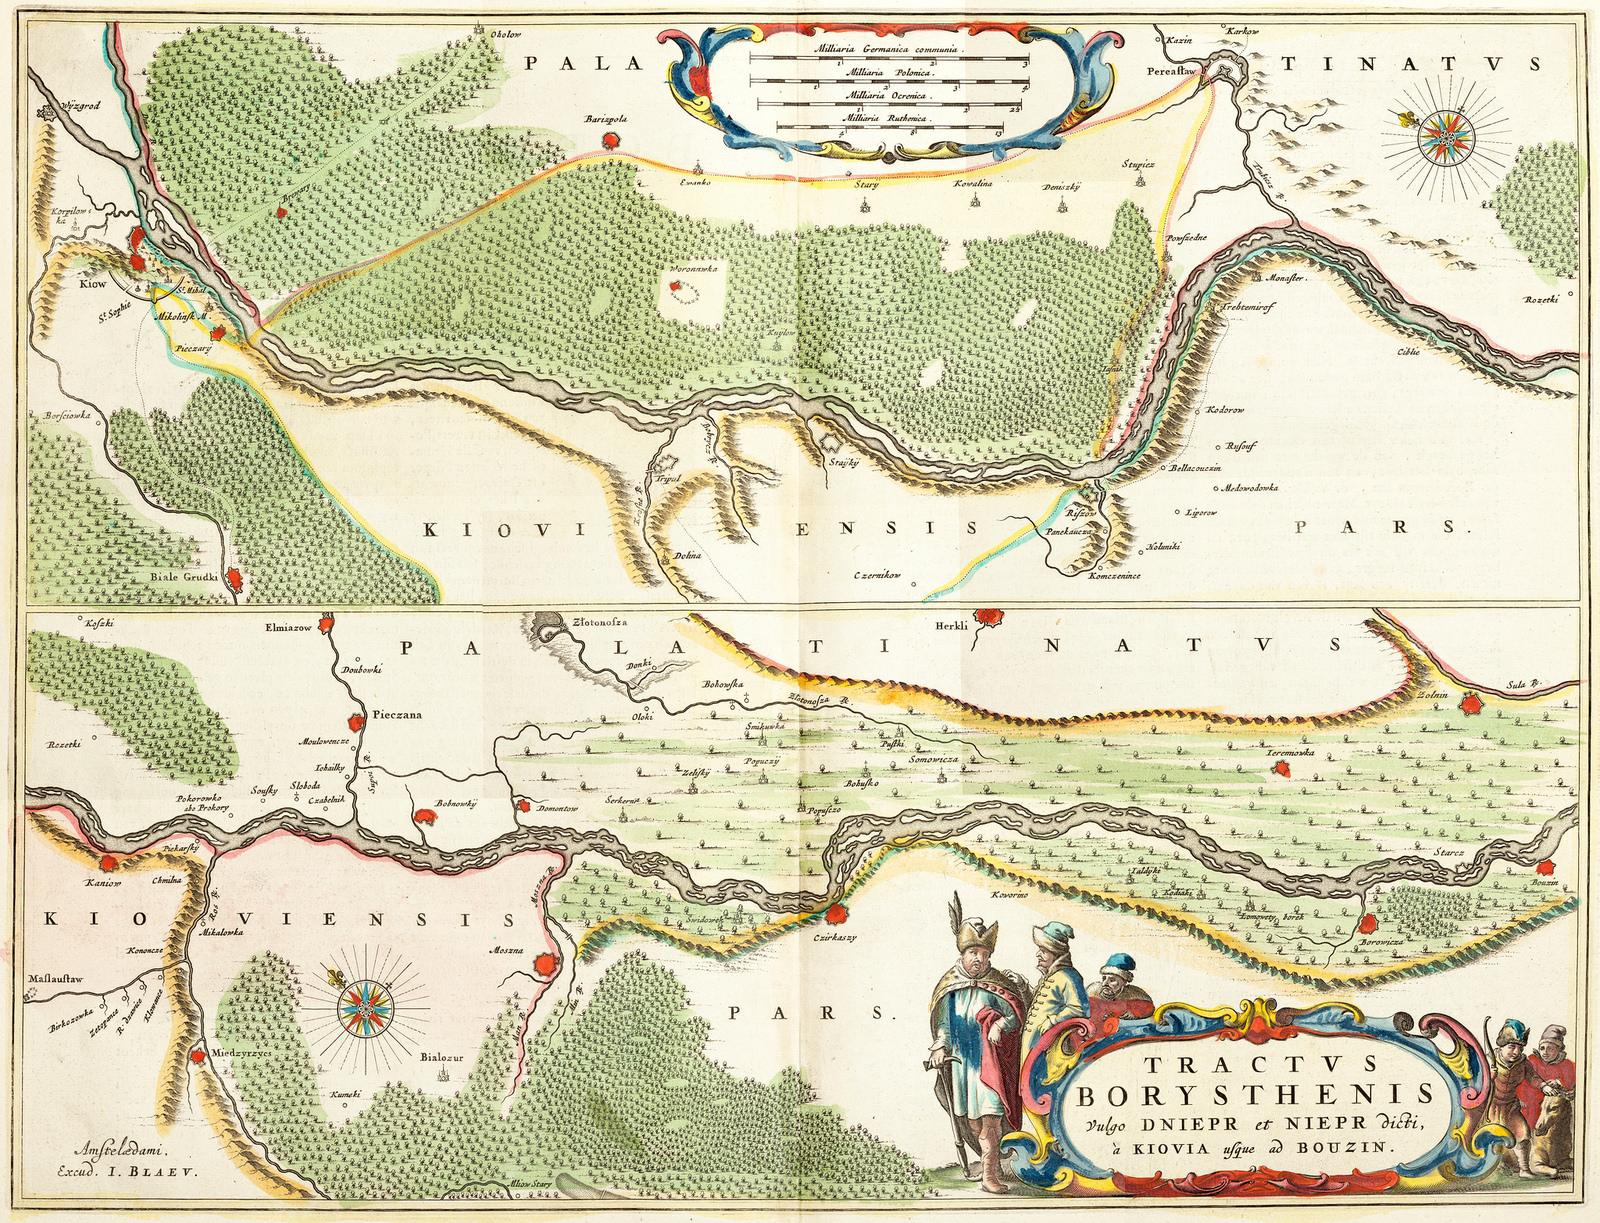 Tractus Borysthenis 1662(1)